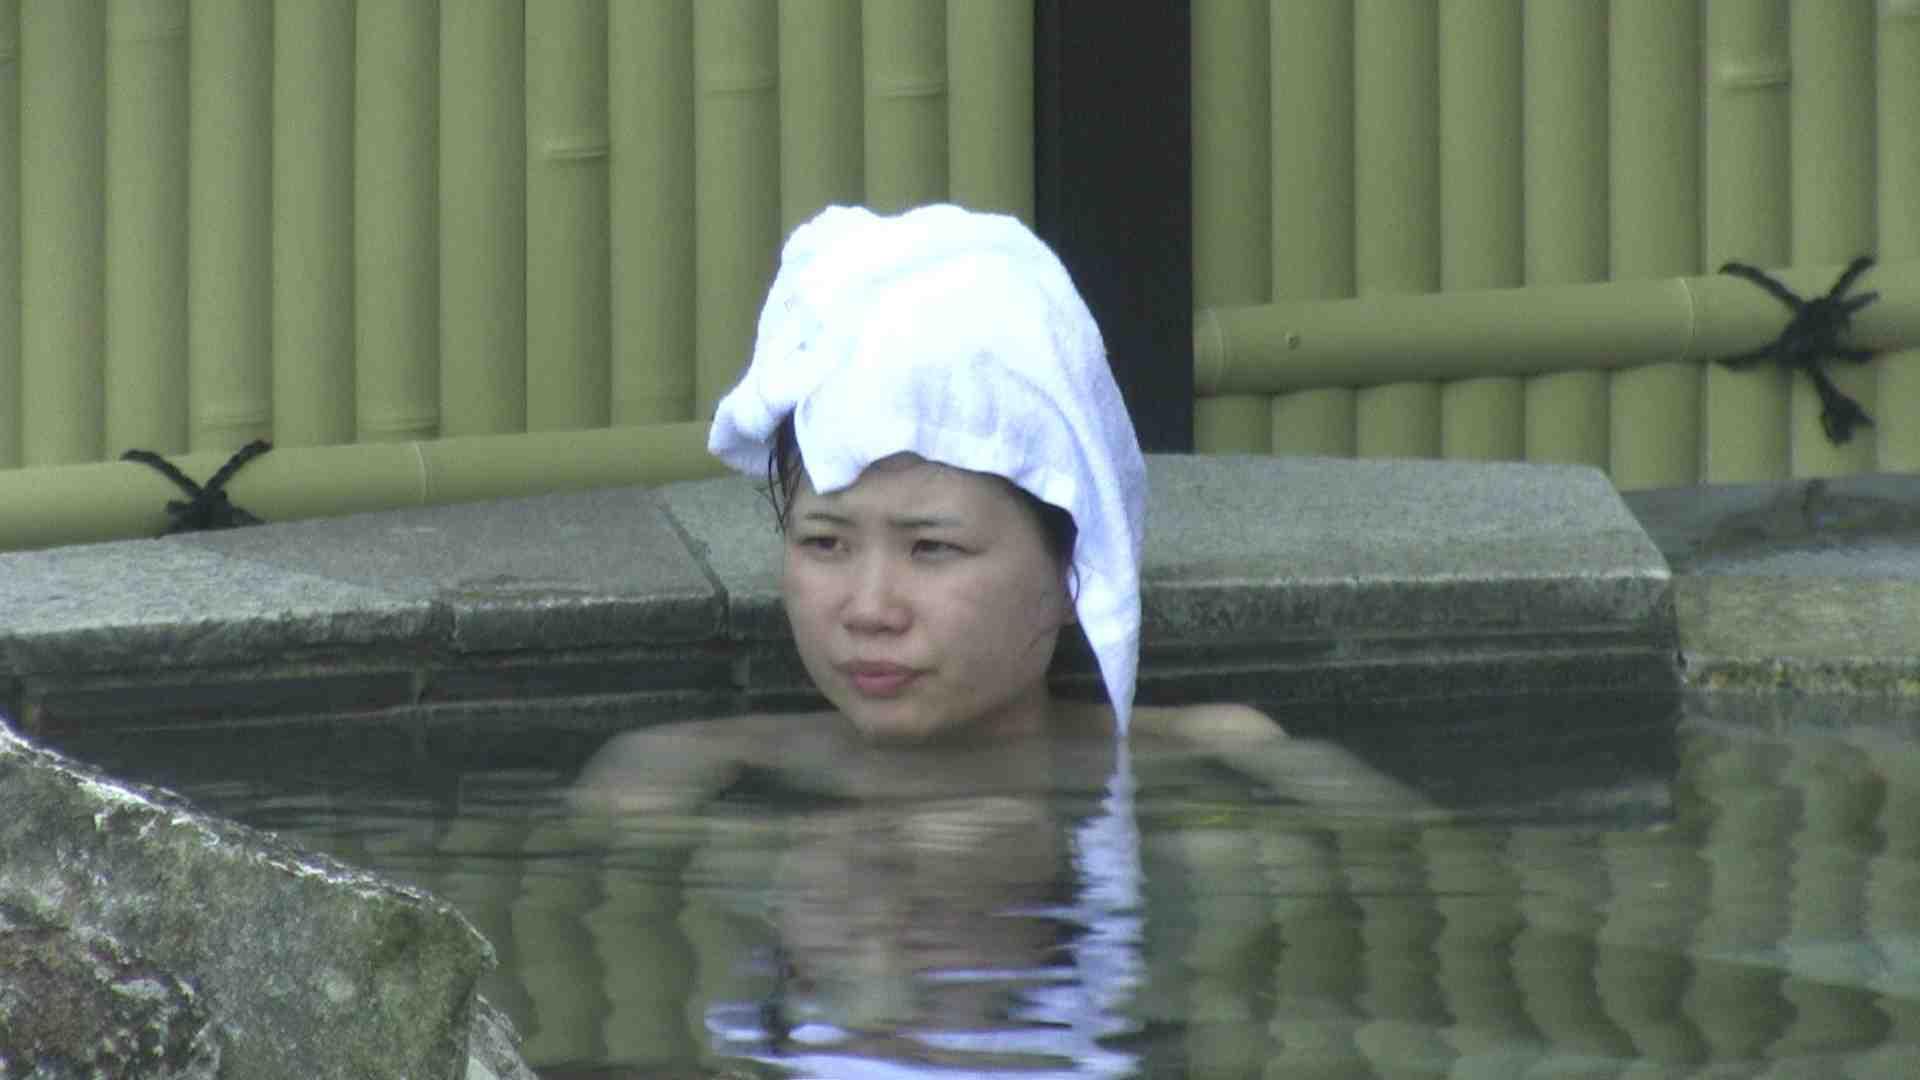 Aquaな露天風呂Vol.183 盗撮 | OLセックス  69画像 13